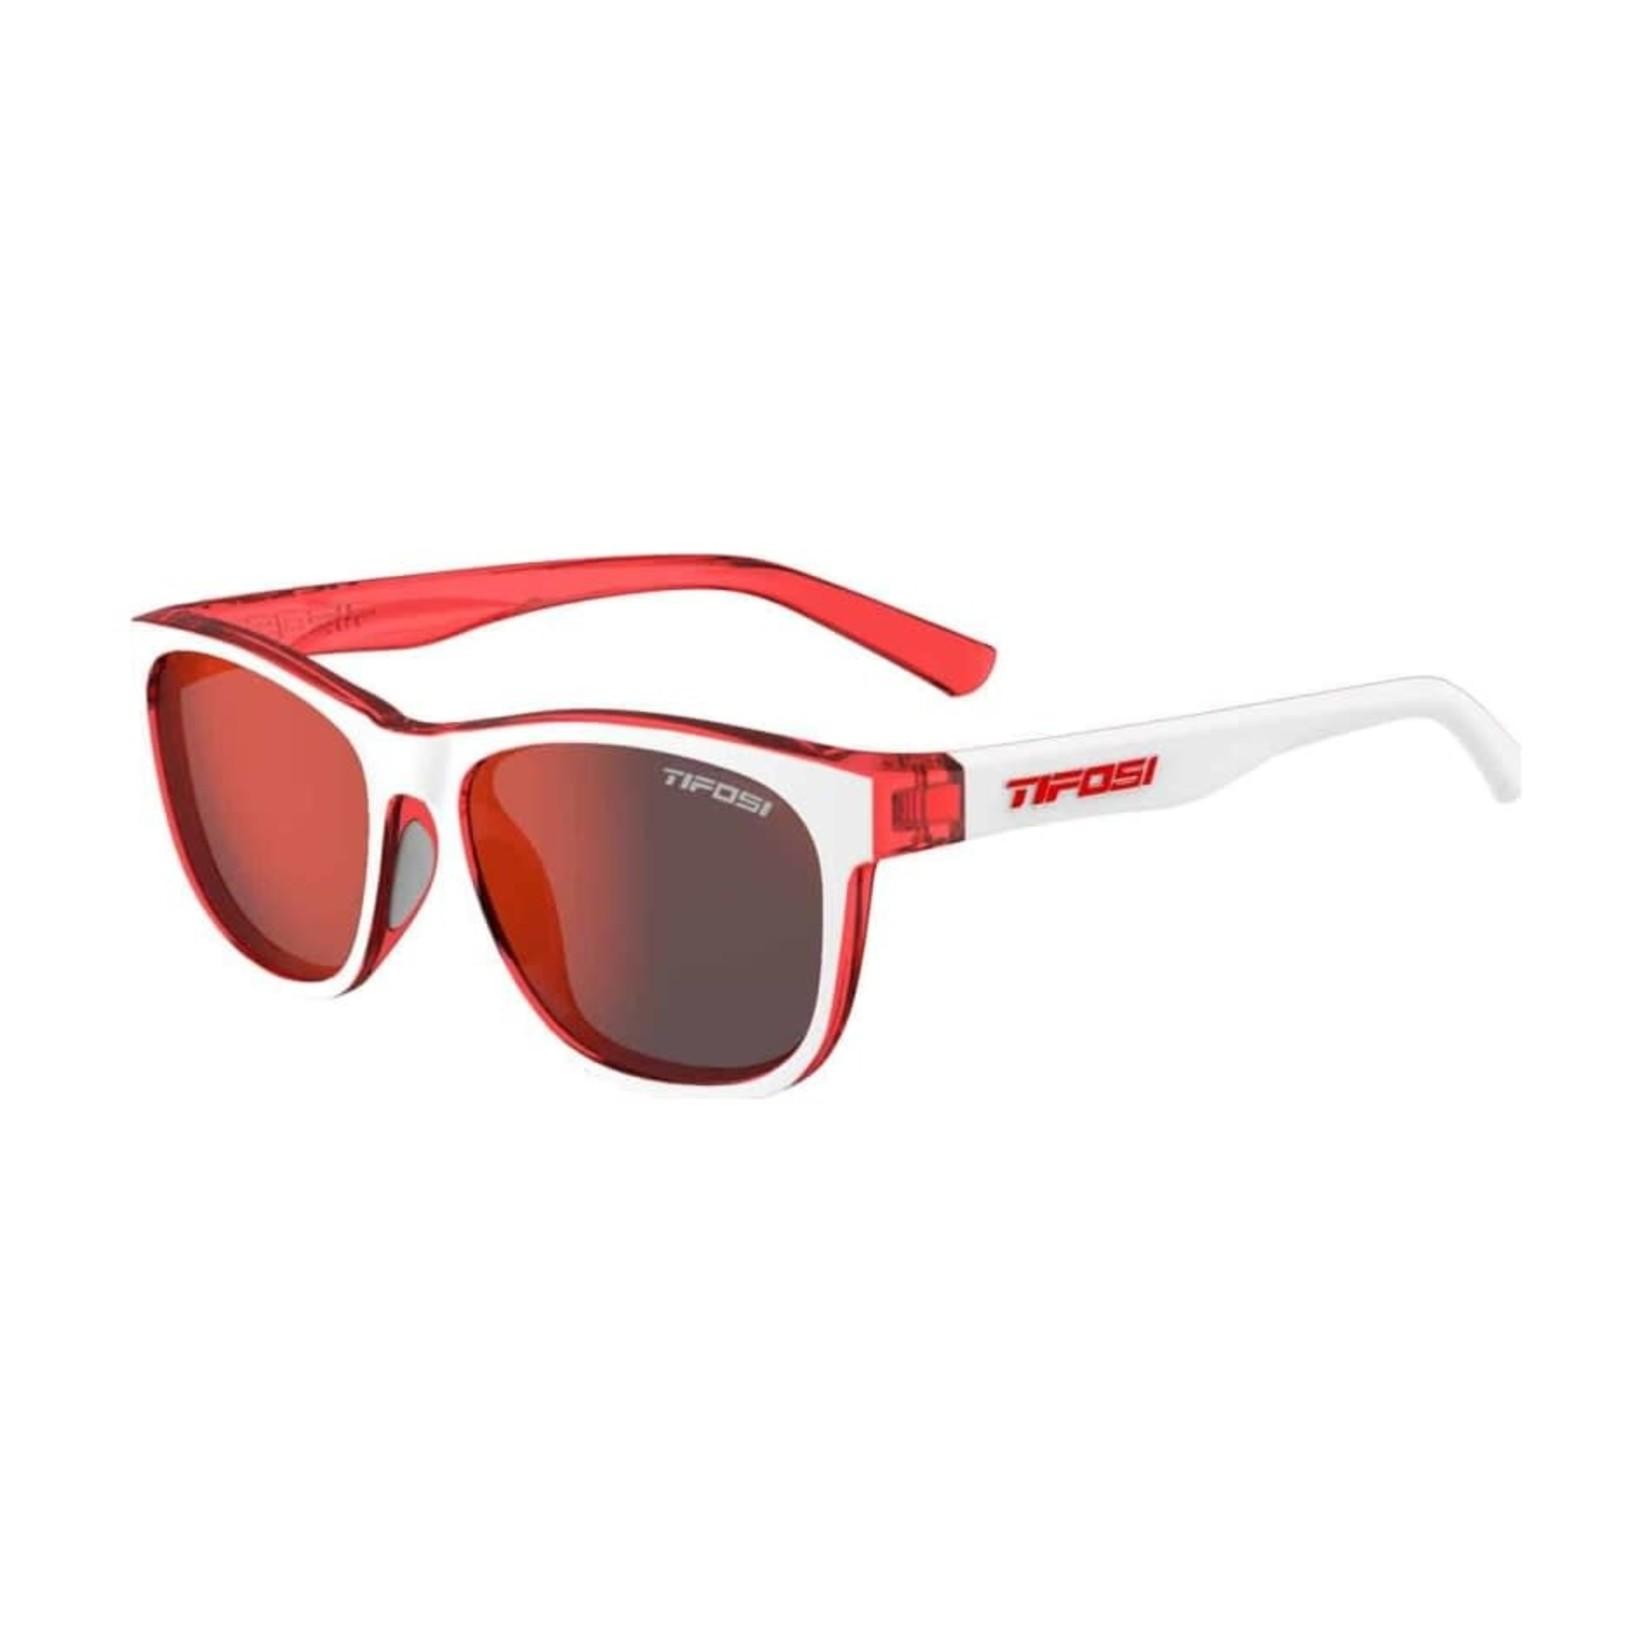 Tifosi Optics Swank, Icicle Red Single Lens Sunglasses